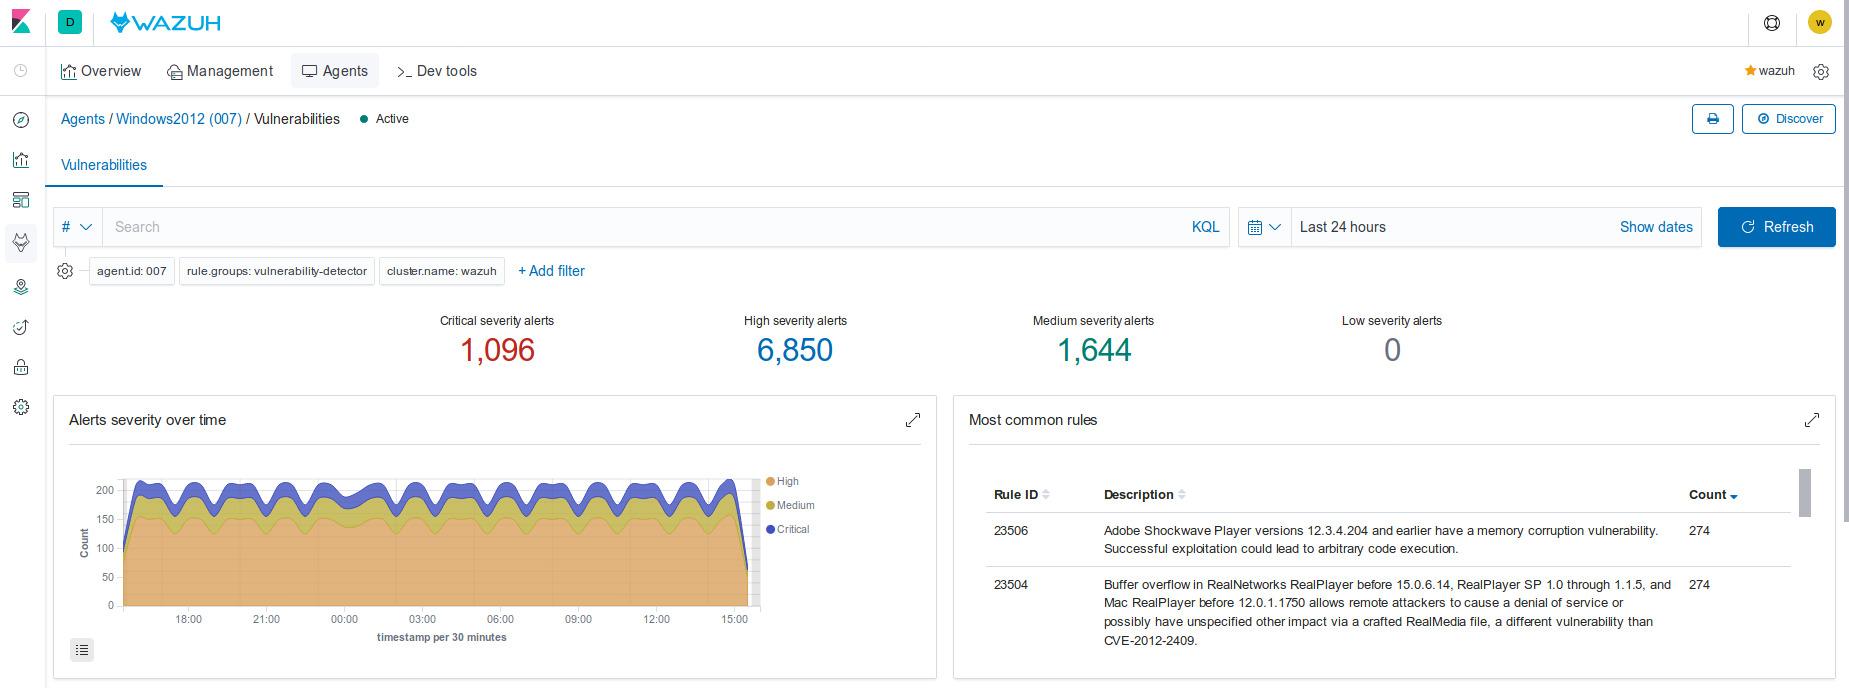 Wazuh v3.11 vulnerability detector Windows Kibana dashboard